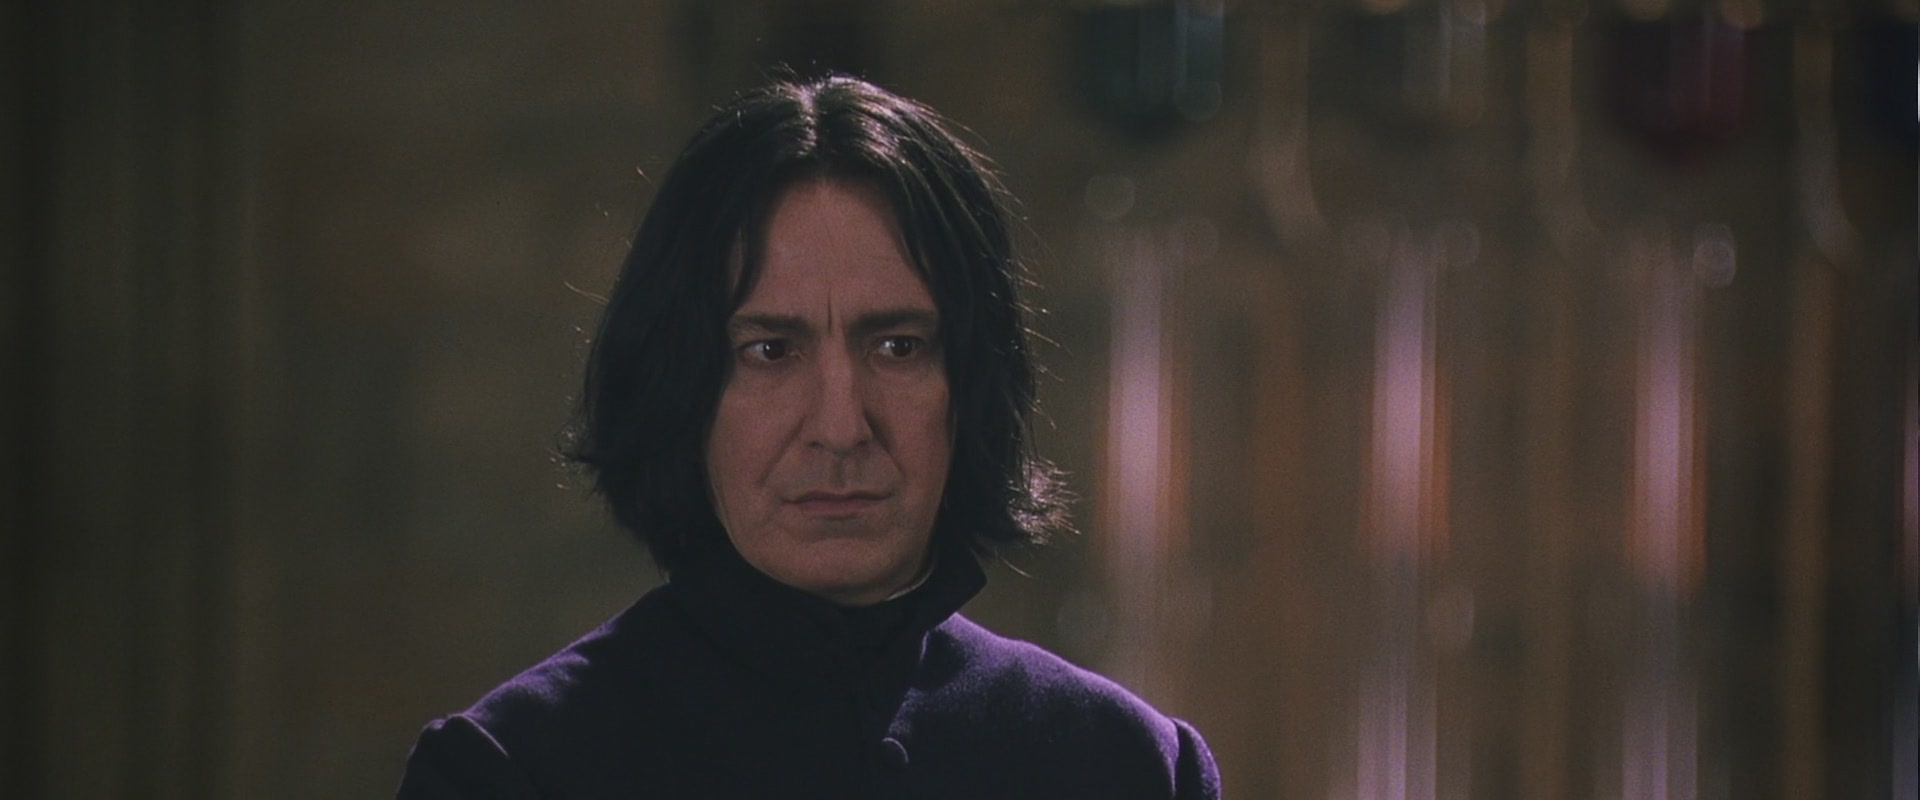 Harry amp hermione secret affair 6